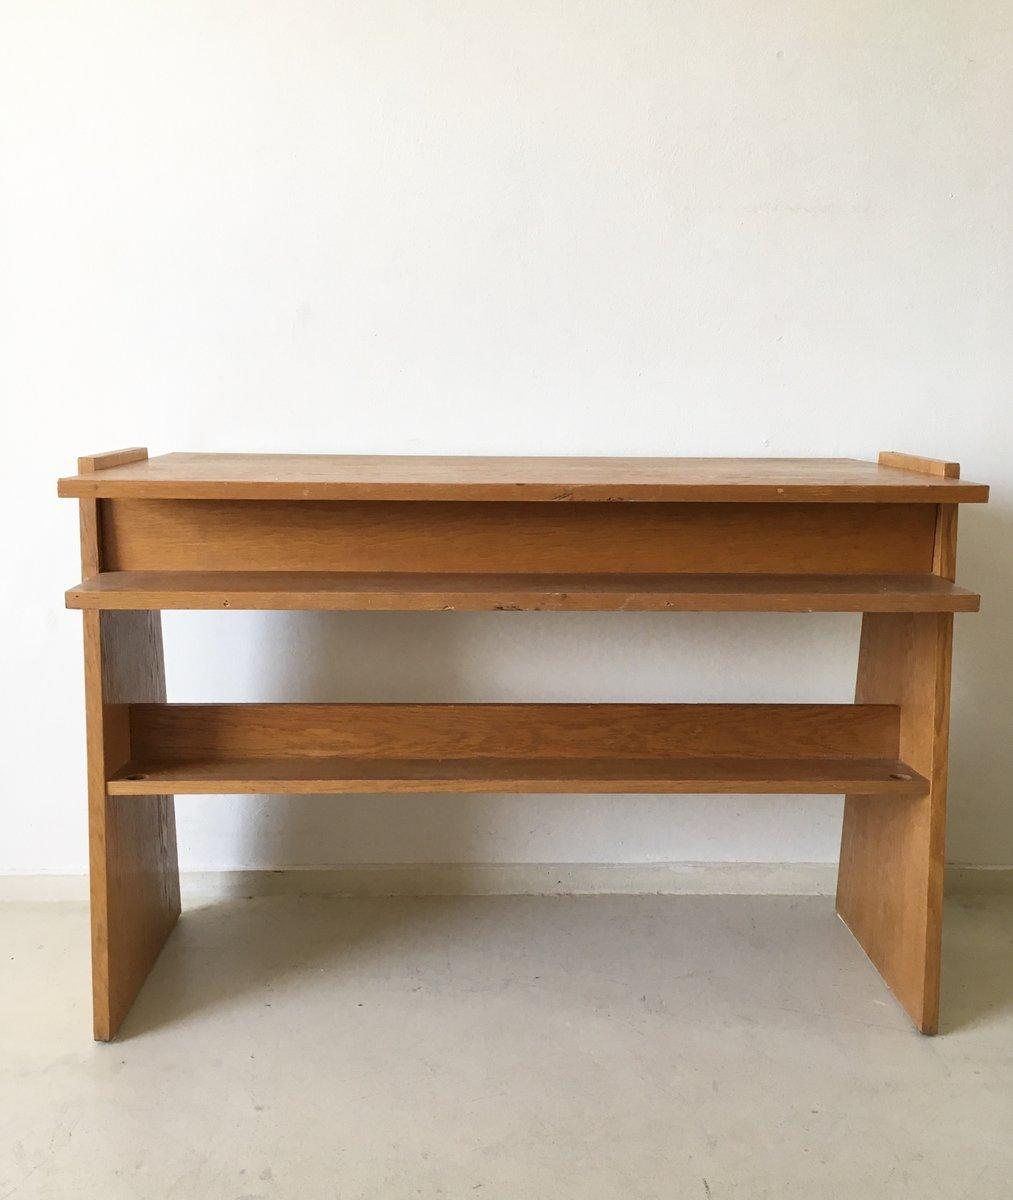 petit bureau vintage constructiviste de ernst merkel en vente sur pamono. Black Bedroom Furniture Sets. Home Design Ideas